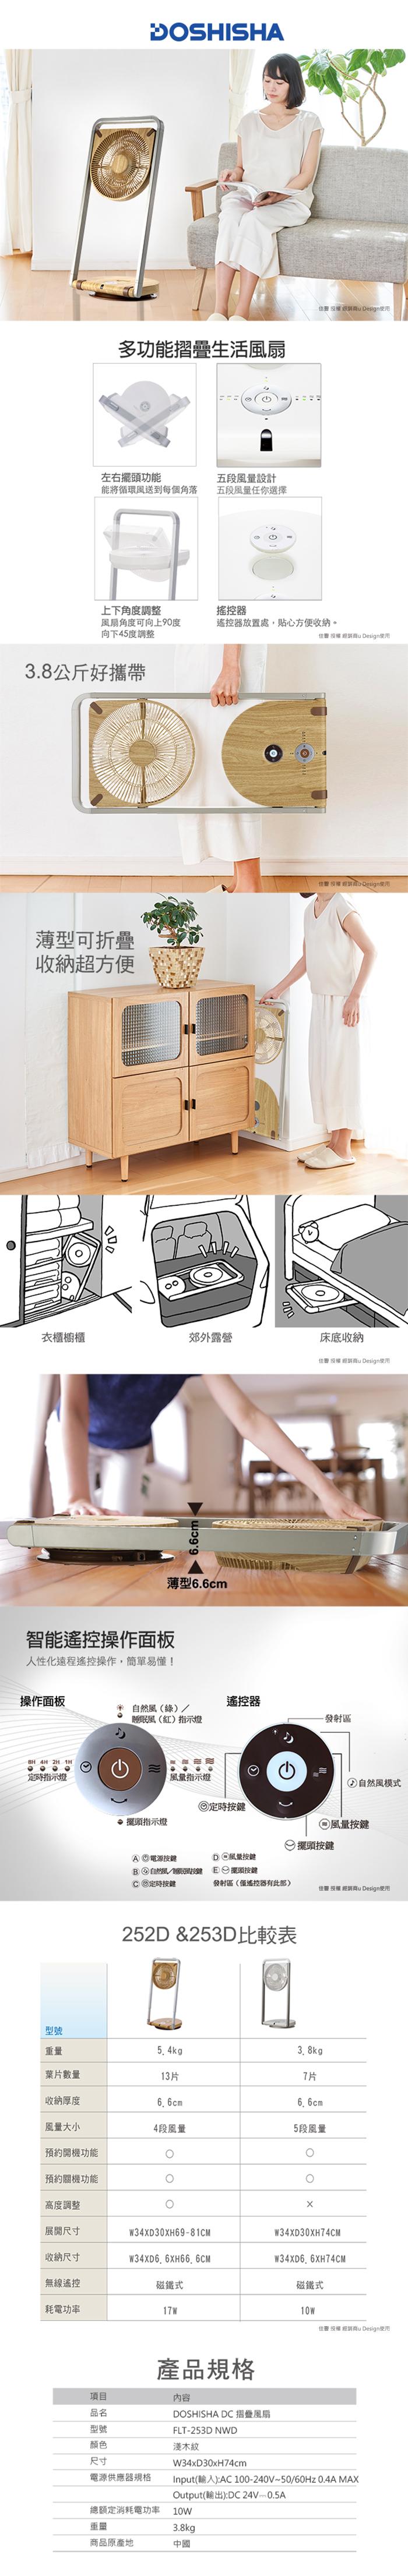 DOSHISHA|摺疊風扇 FLT-253D NWD 無伸縮版木紋色